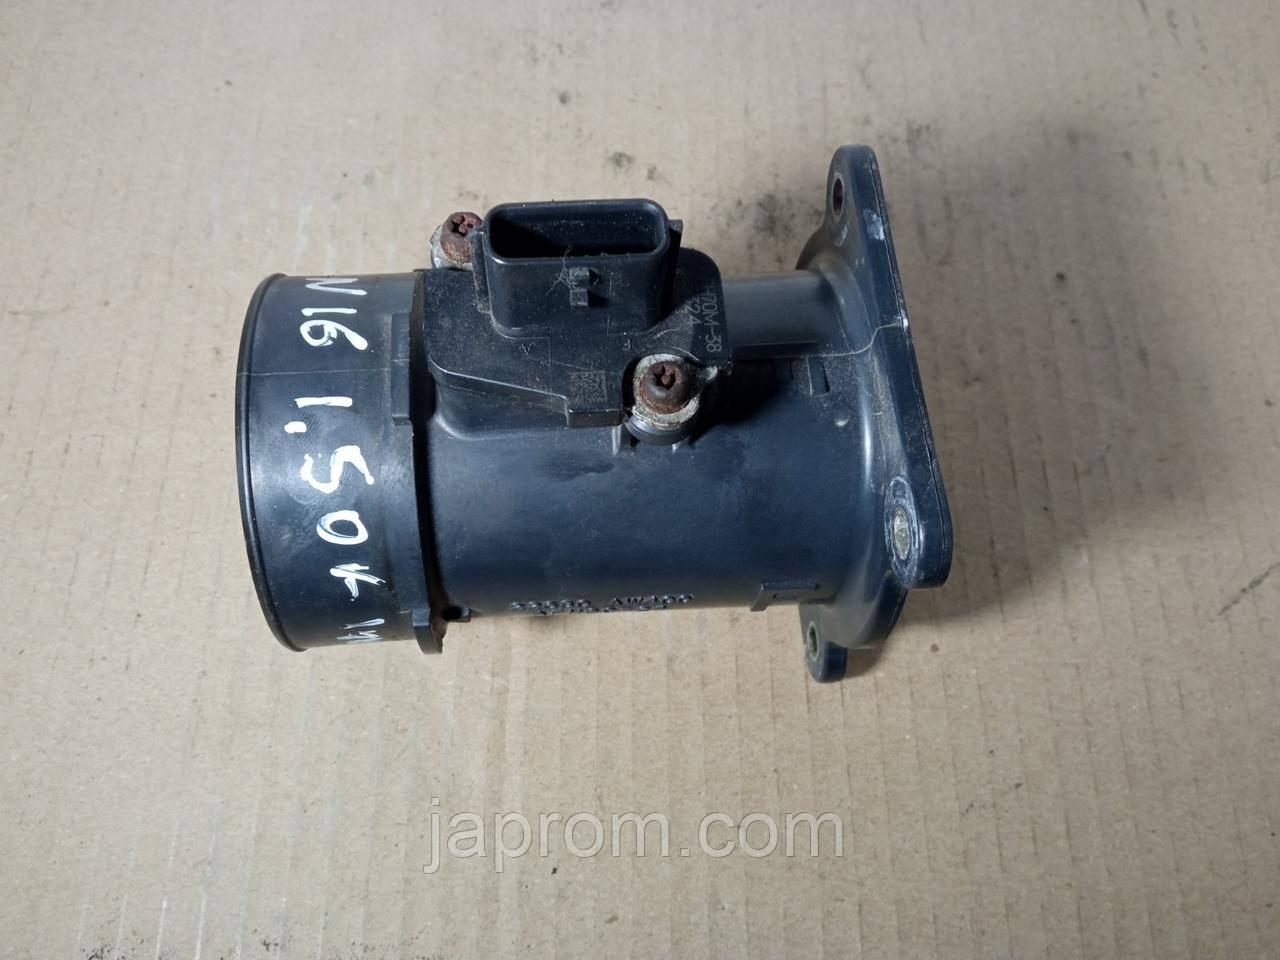 Датчик расхода (потока) воздуха, расходомер M.A.F. Nissan Almera N16 Primera P12 Xtrail T30